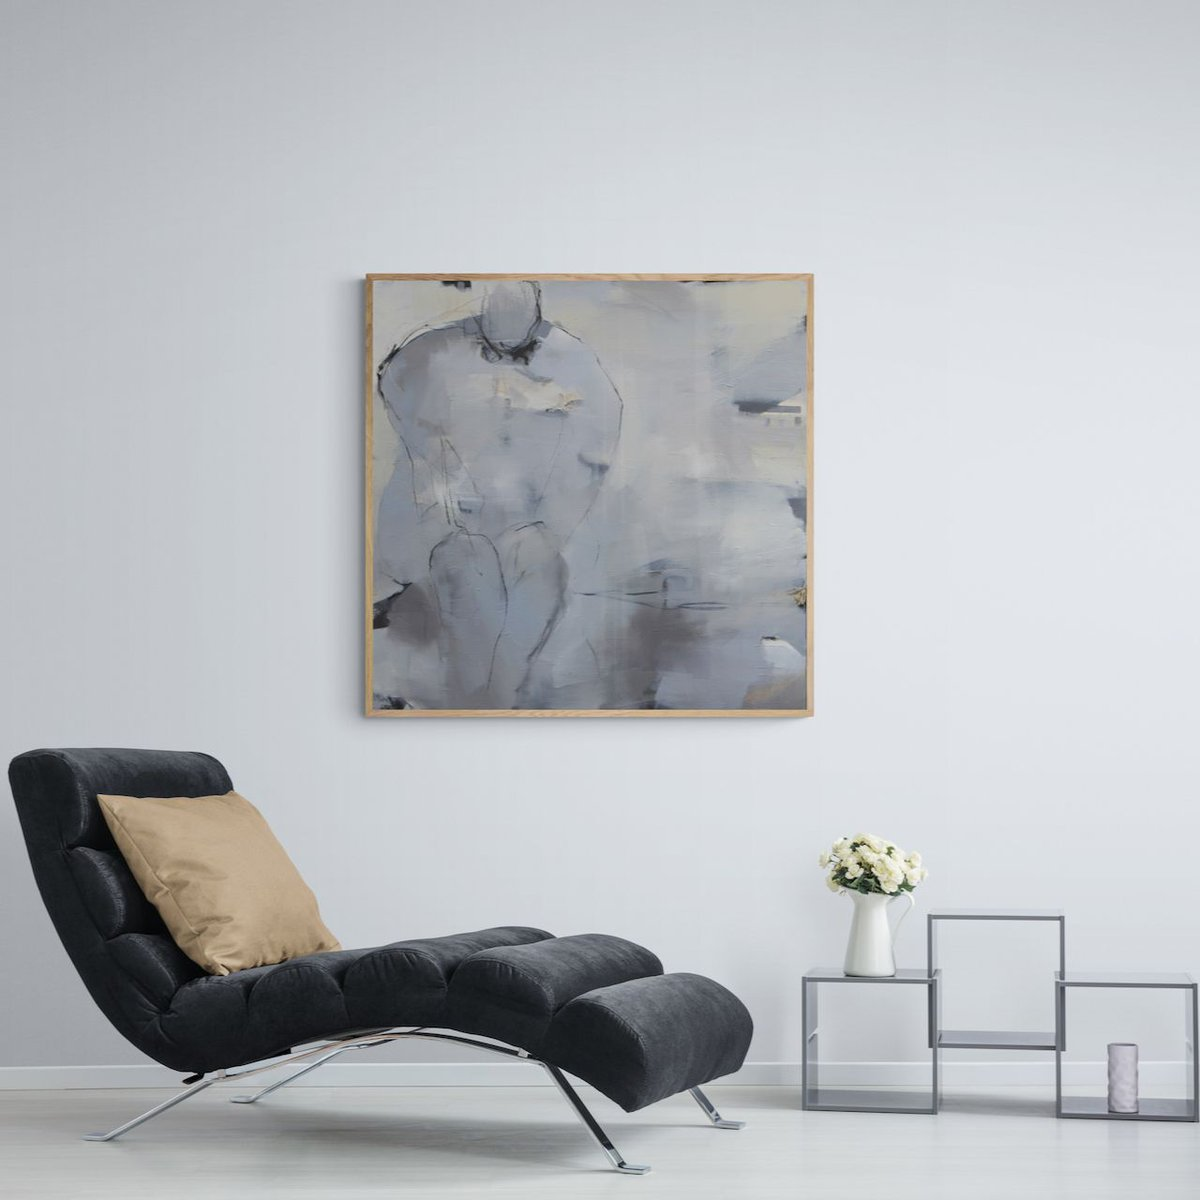 New painting...Slalom, 36x36, Oil on canvas  #abstractart #artista #galerie #oilpainting #artlover #dailyinspiration #gallerypic.twitter.com/rEcUQYsPQP